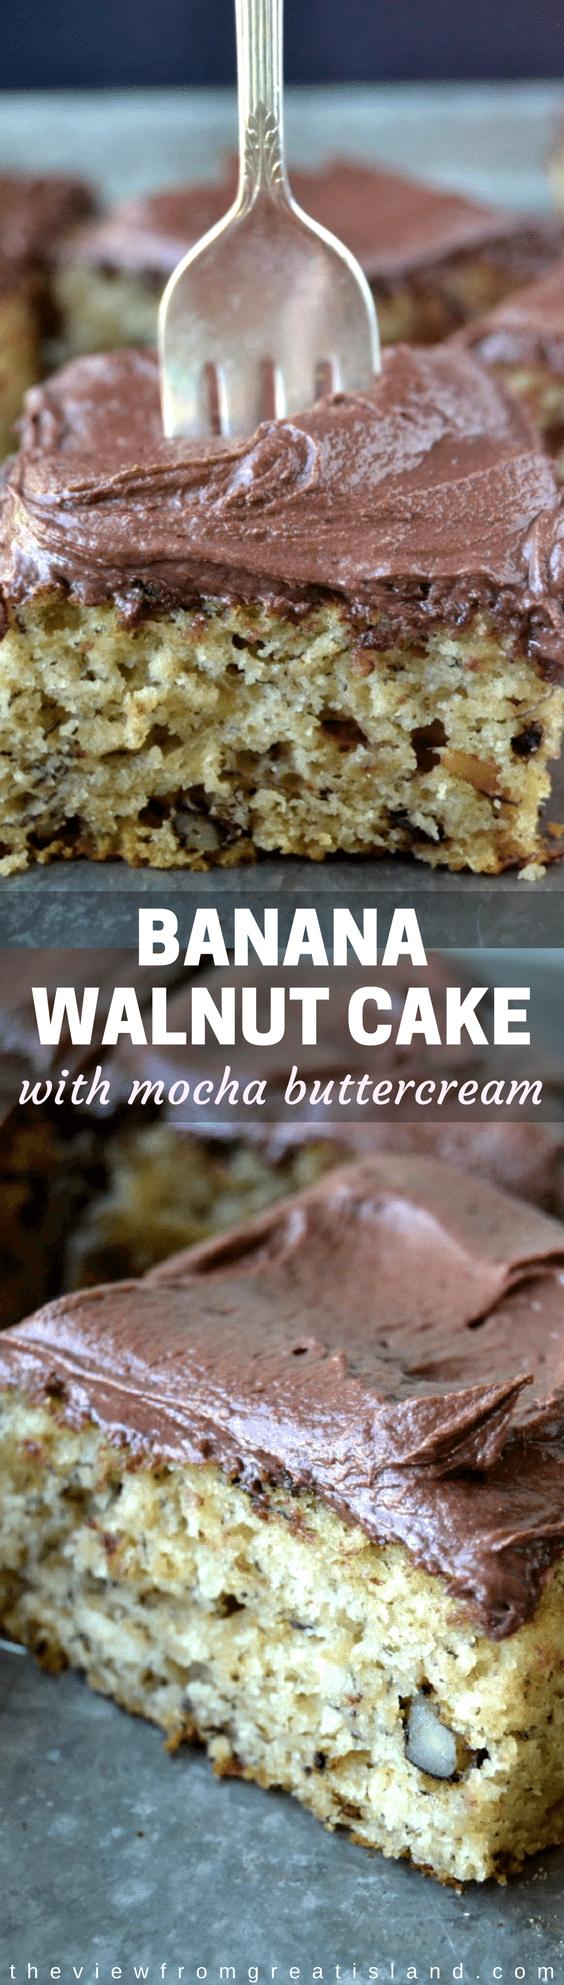 Banana Walnut Cake with Mocha Buttercream ~ this little frosted banana snack cake is definitely a step above the rest! #bananacake #bananacakerecipe #mochabuttercream #buttercream #breakfastcake #dessert #snackcake #chocolate #bananas #cake #bananarecipe